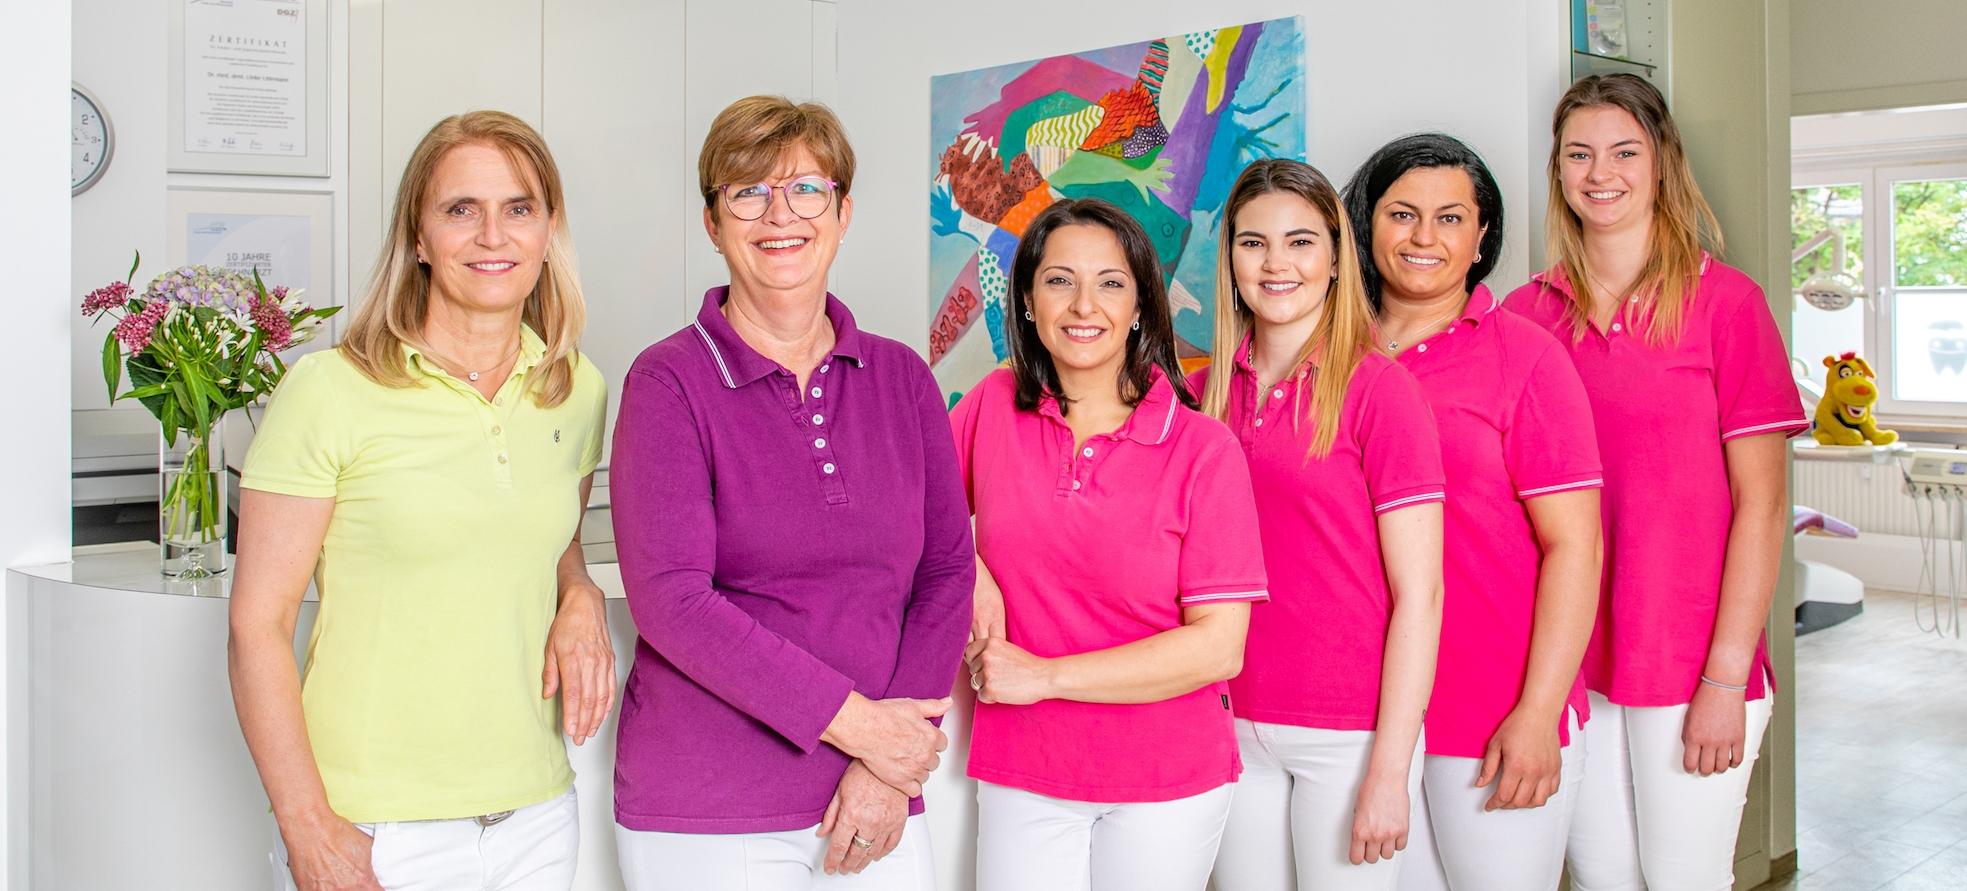 Teamfoto Praxis Dr. Uhlemann